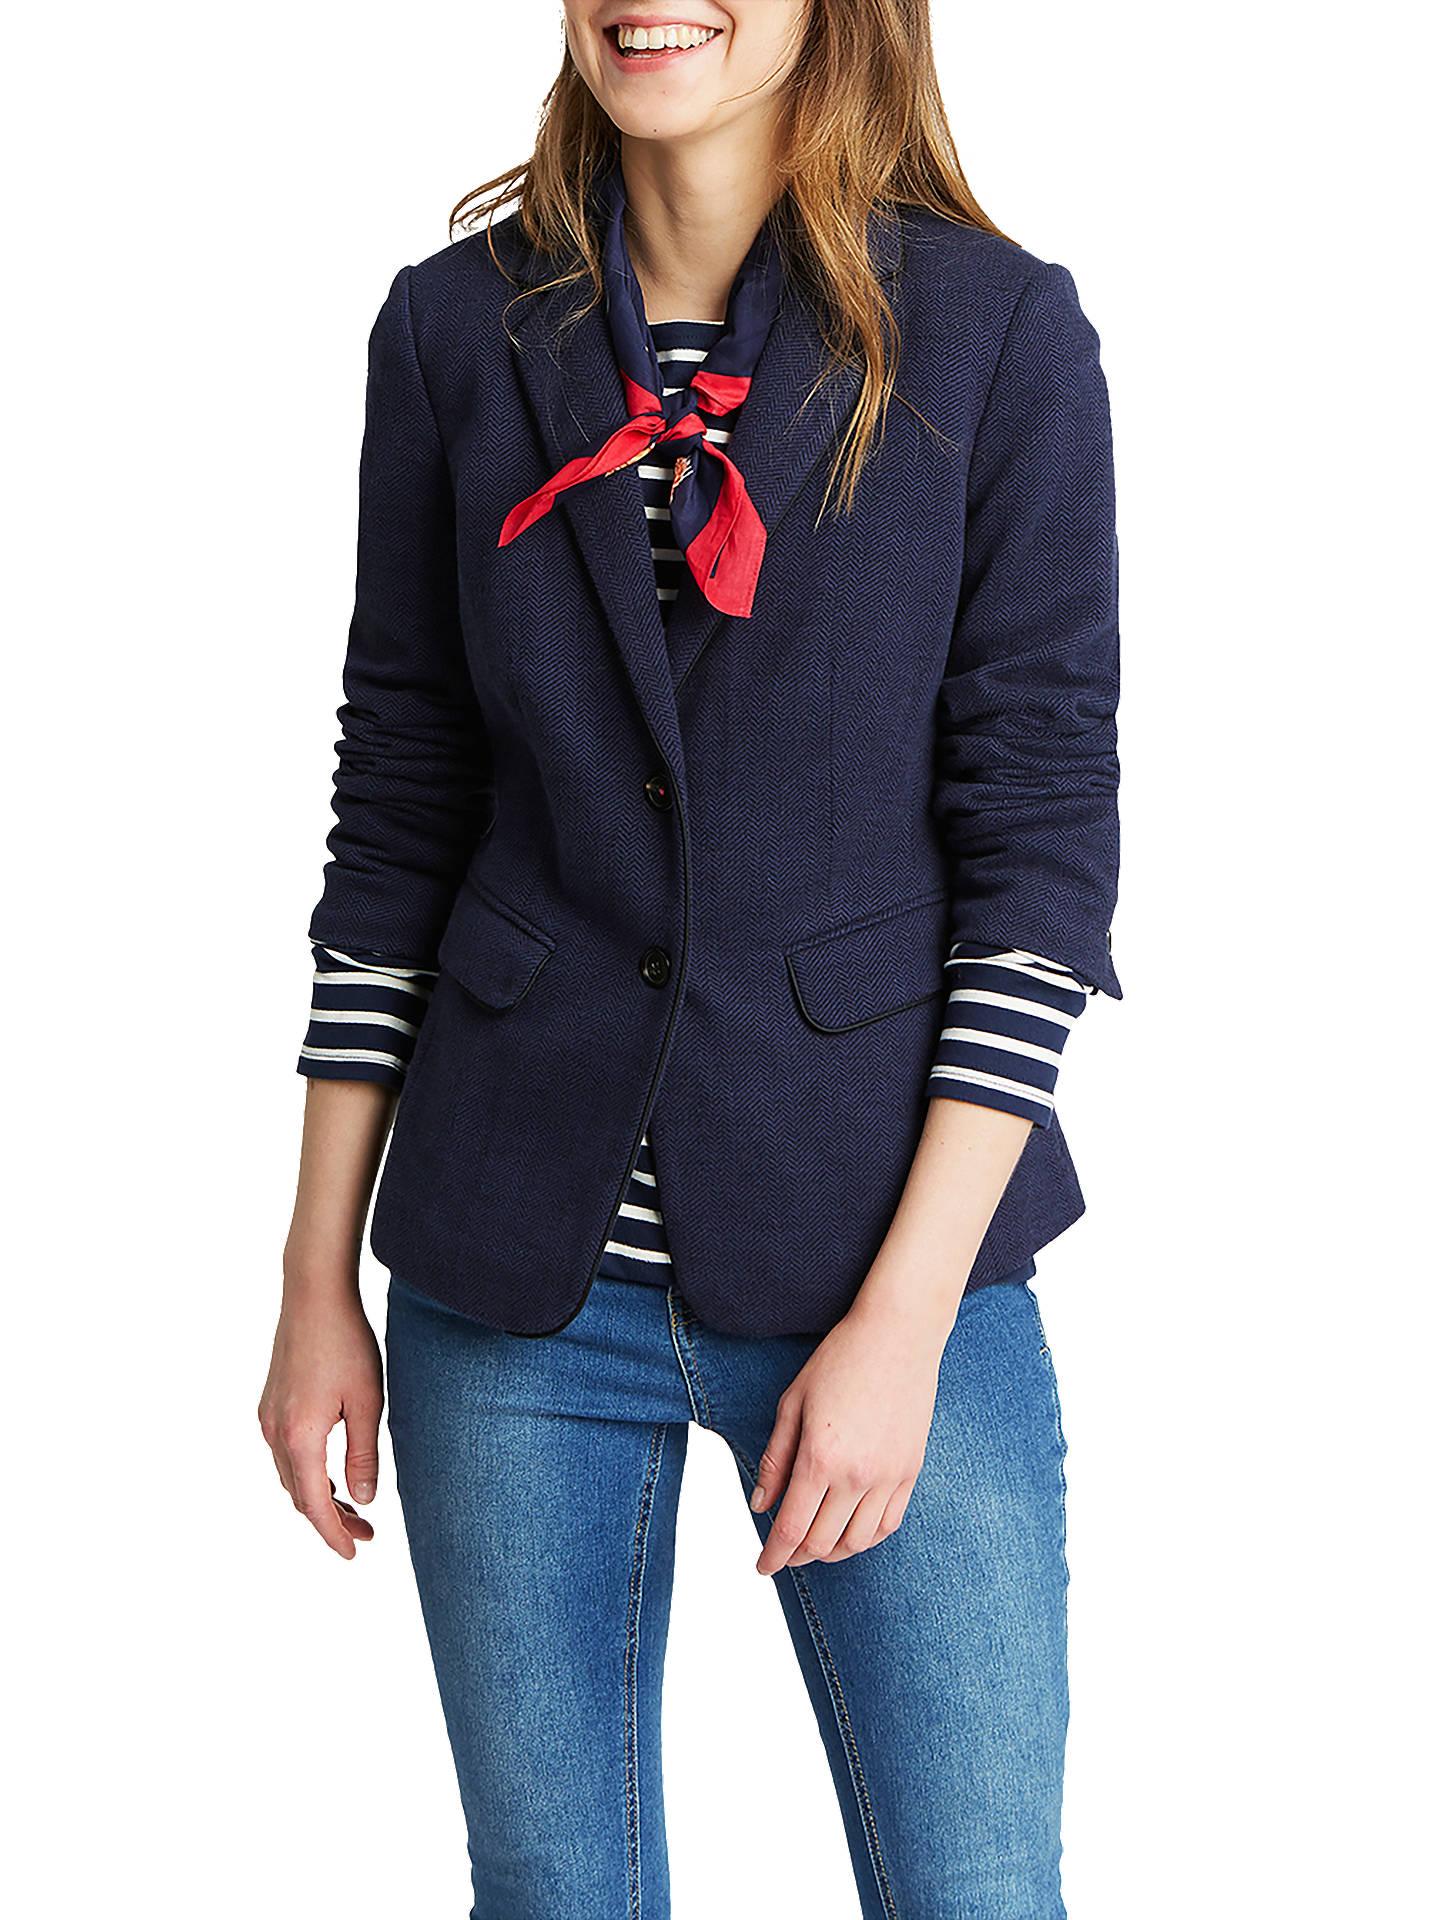 2c30a6de5 New Women's Clothing Joules Ladies Agatha Brown Cotton Blazer UK 12-16